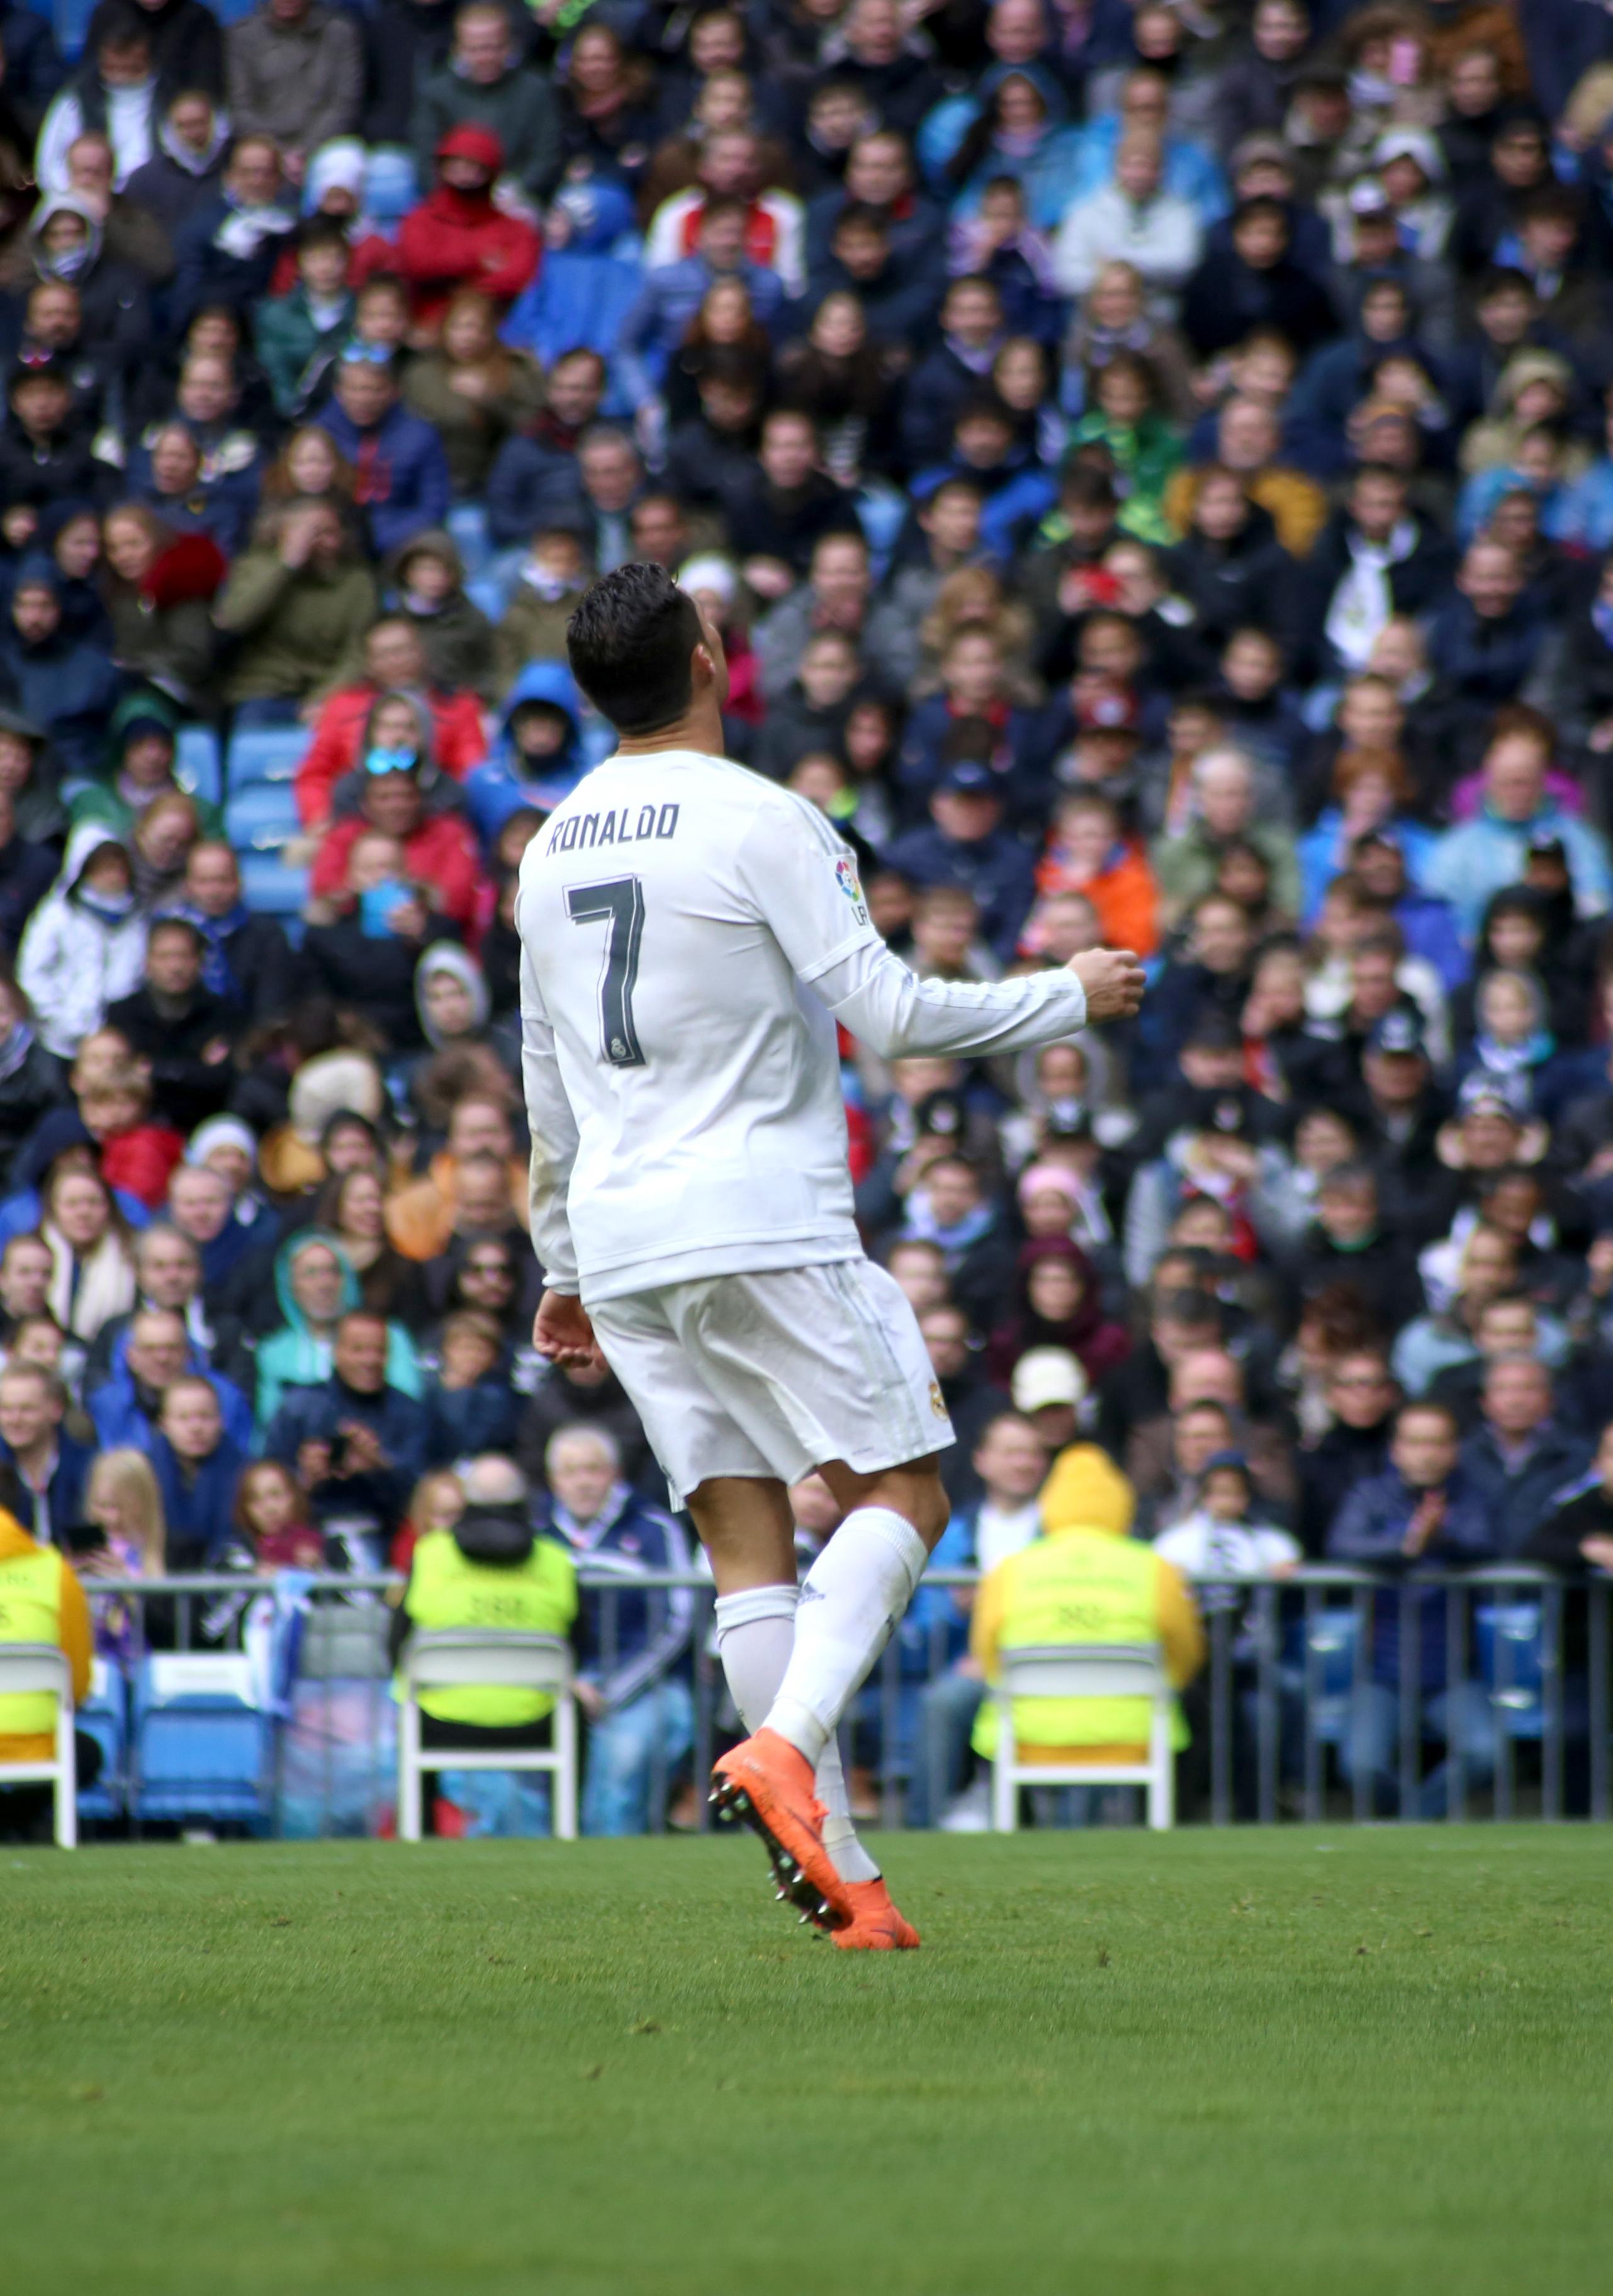 File:Cristiano RonaldoEn el Real Madrid.JPG - Wikimedia ...